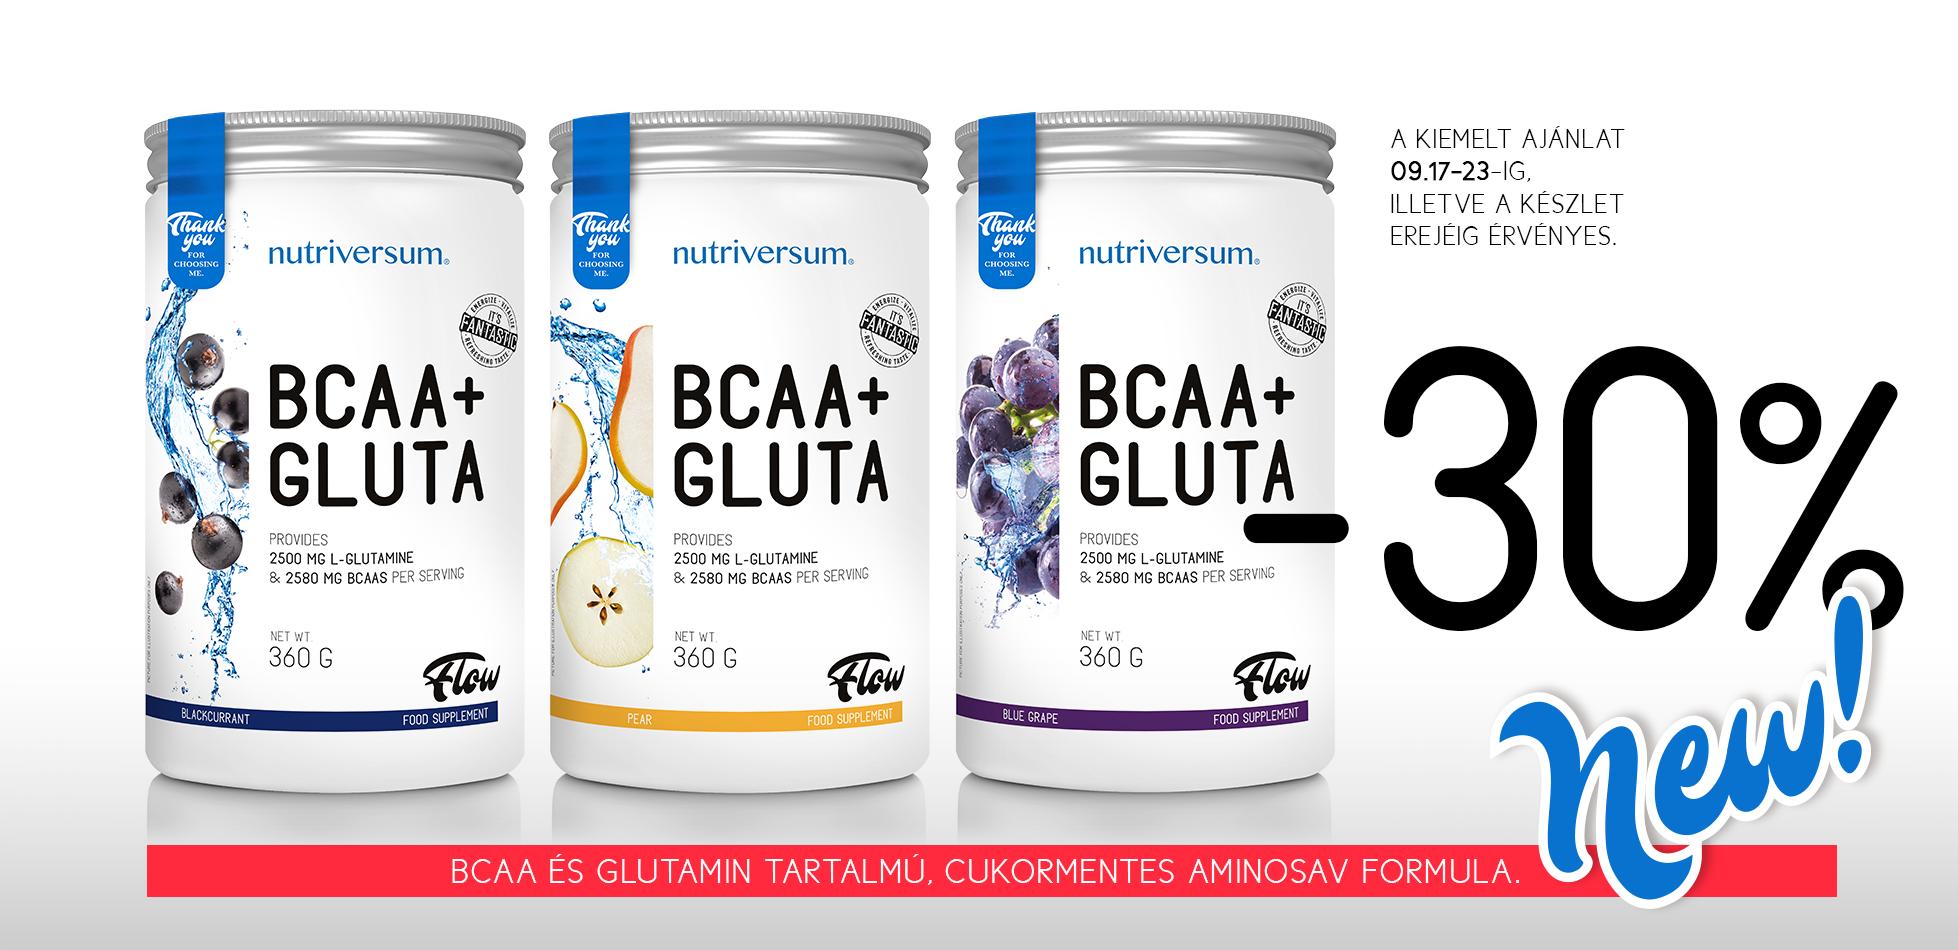 BCAA Gluta